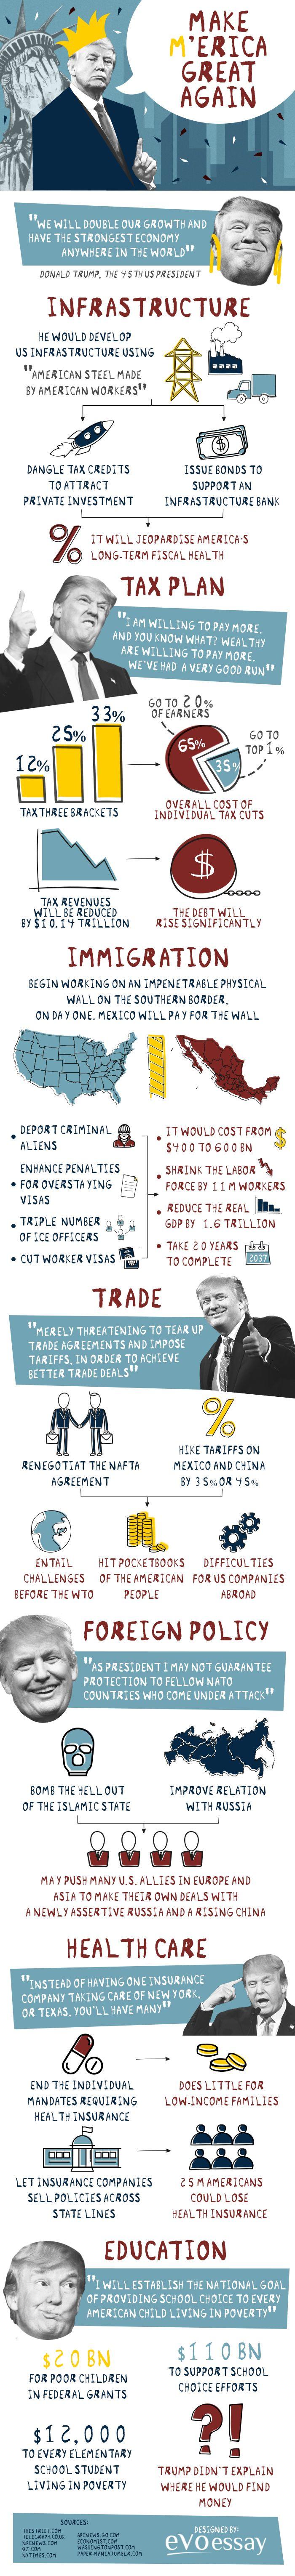 How Trump Will Make America Great Again?